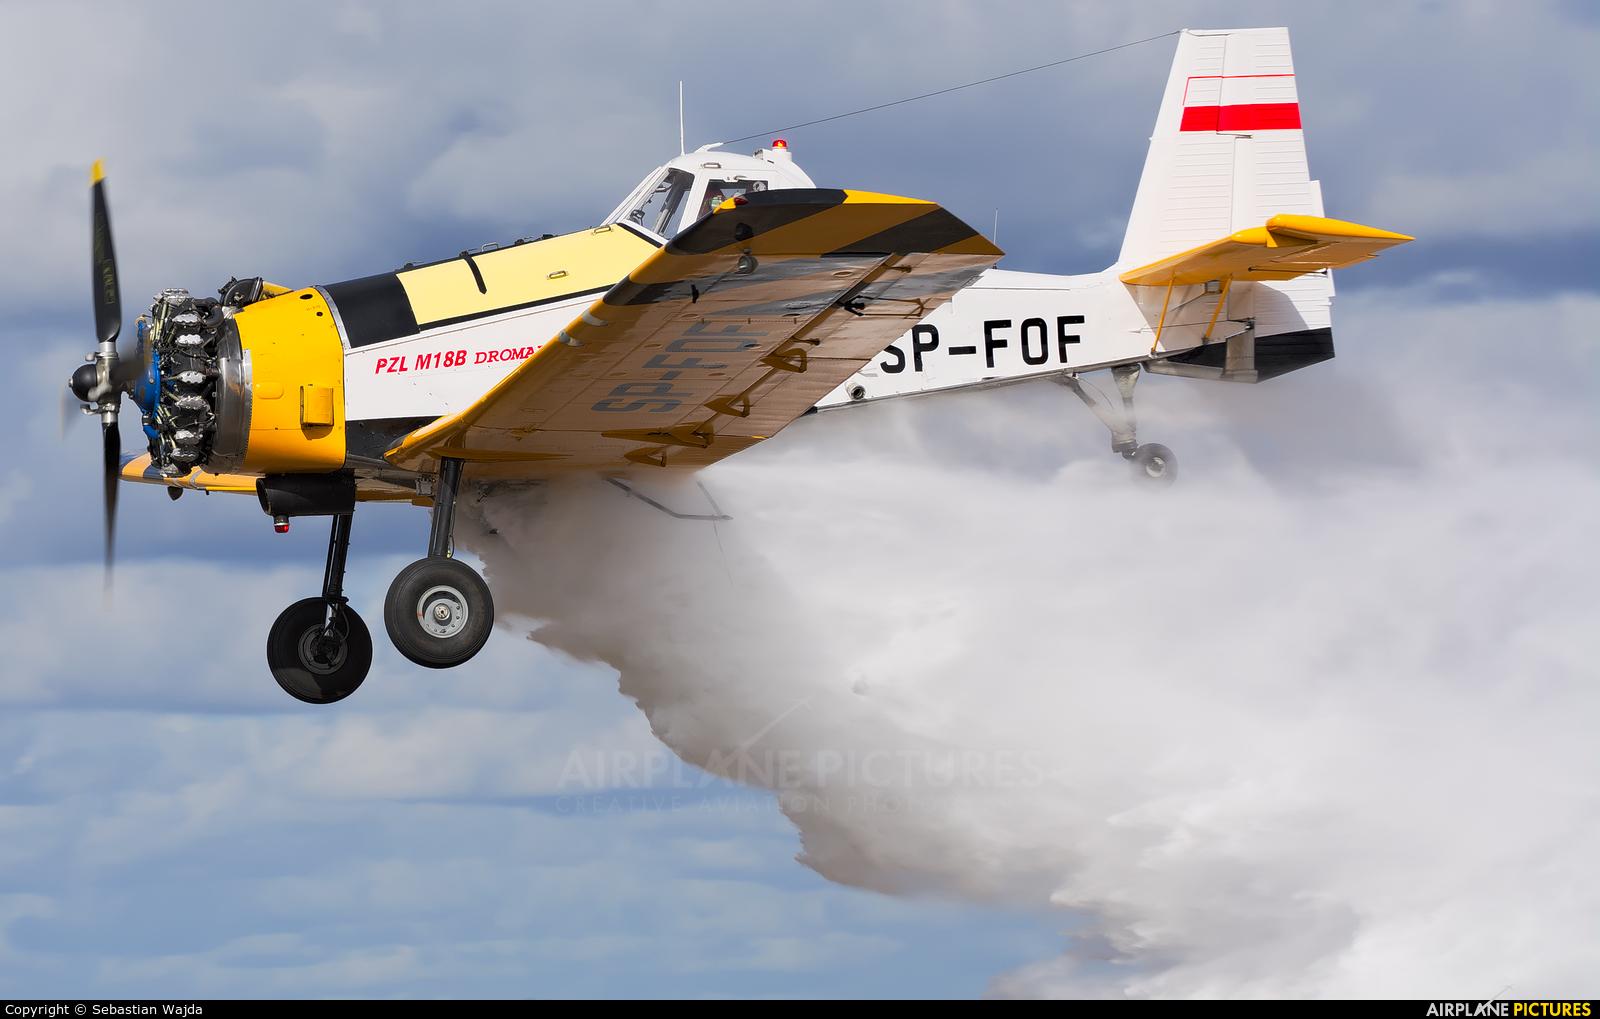 Aerogryf SP-FOF aircraft at Off Airport - Poland